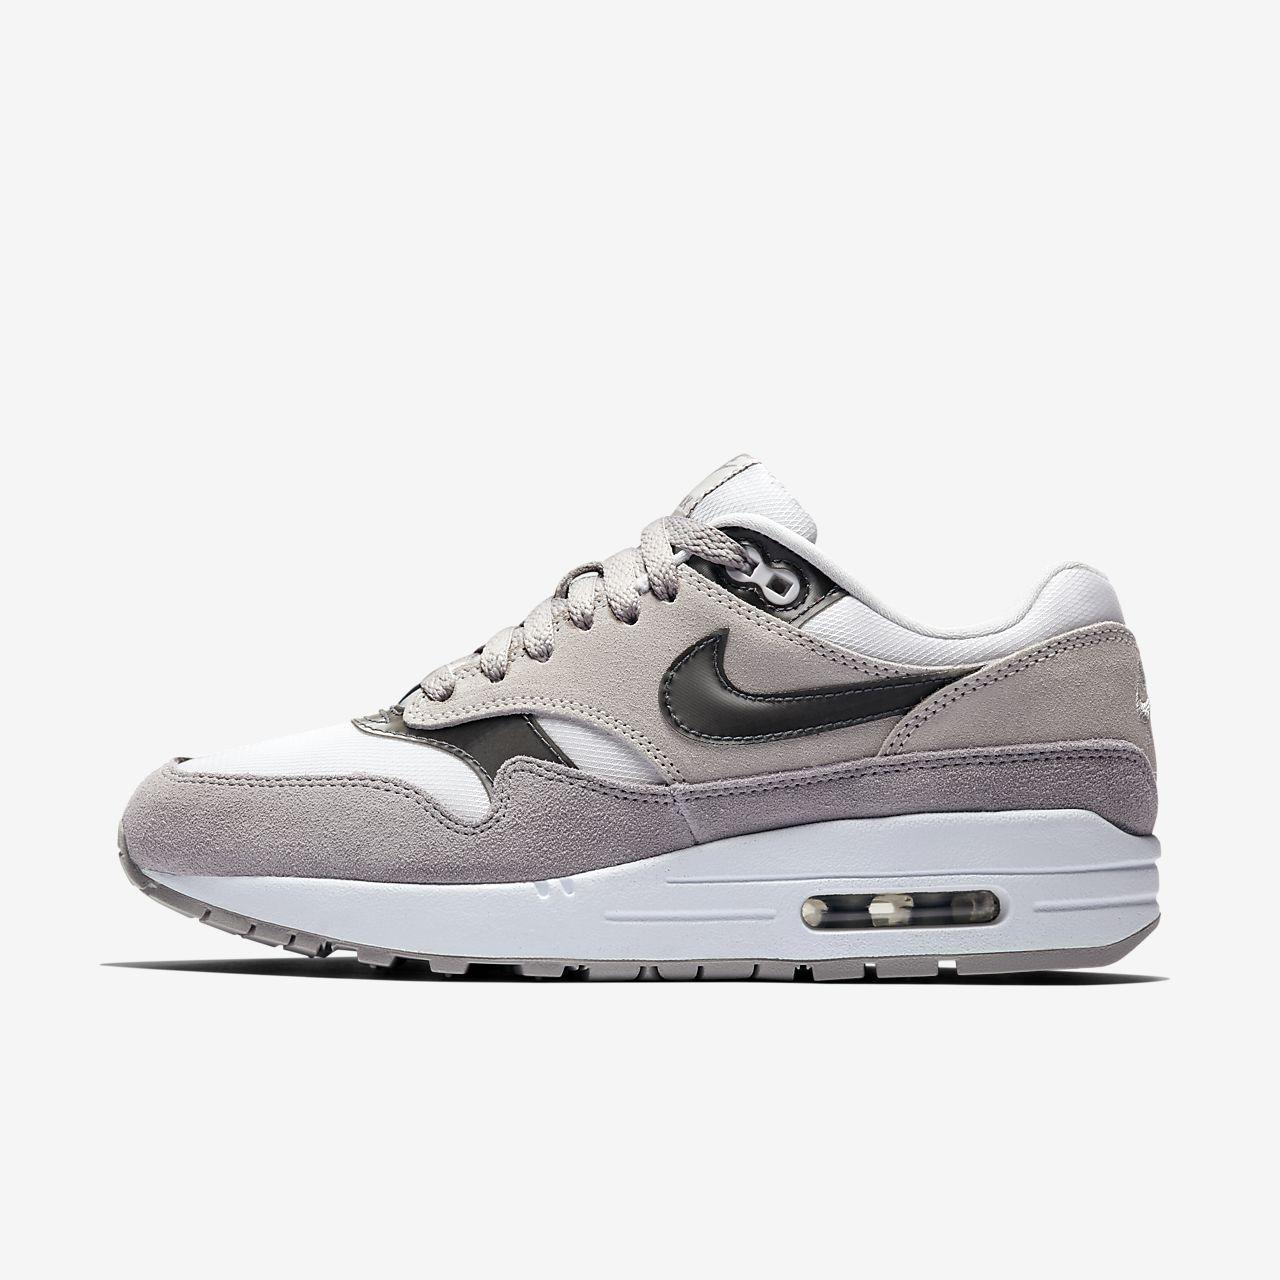 pretty nice 89896 b3dce Sapatilhas Nike Air Max 1 SE para mulher